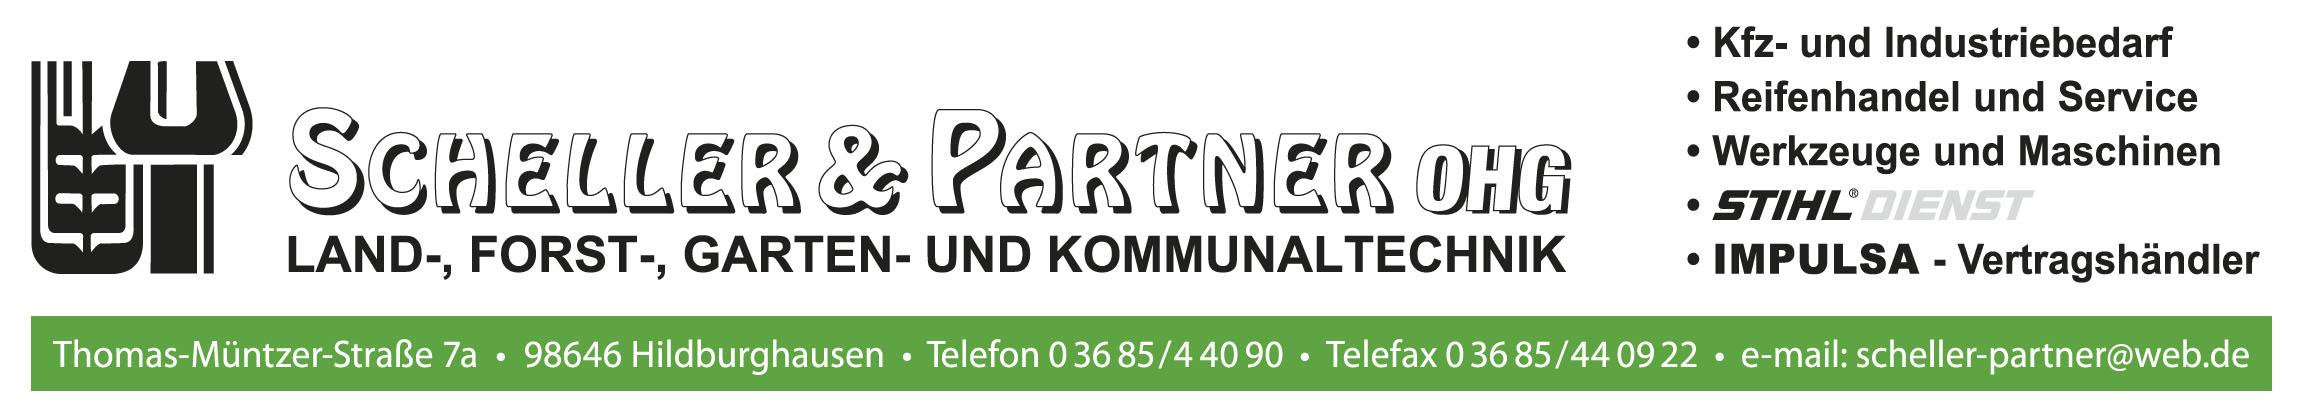 Scheller & Partner OHG